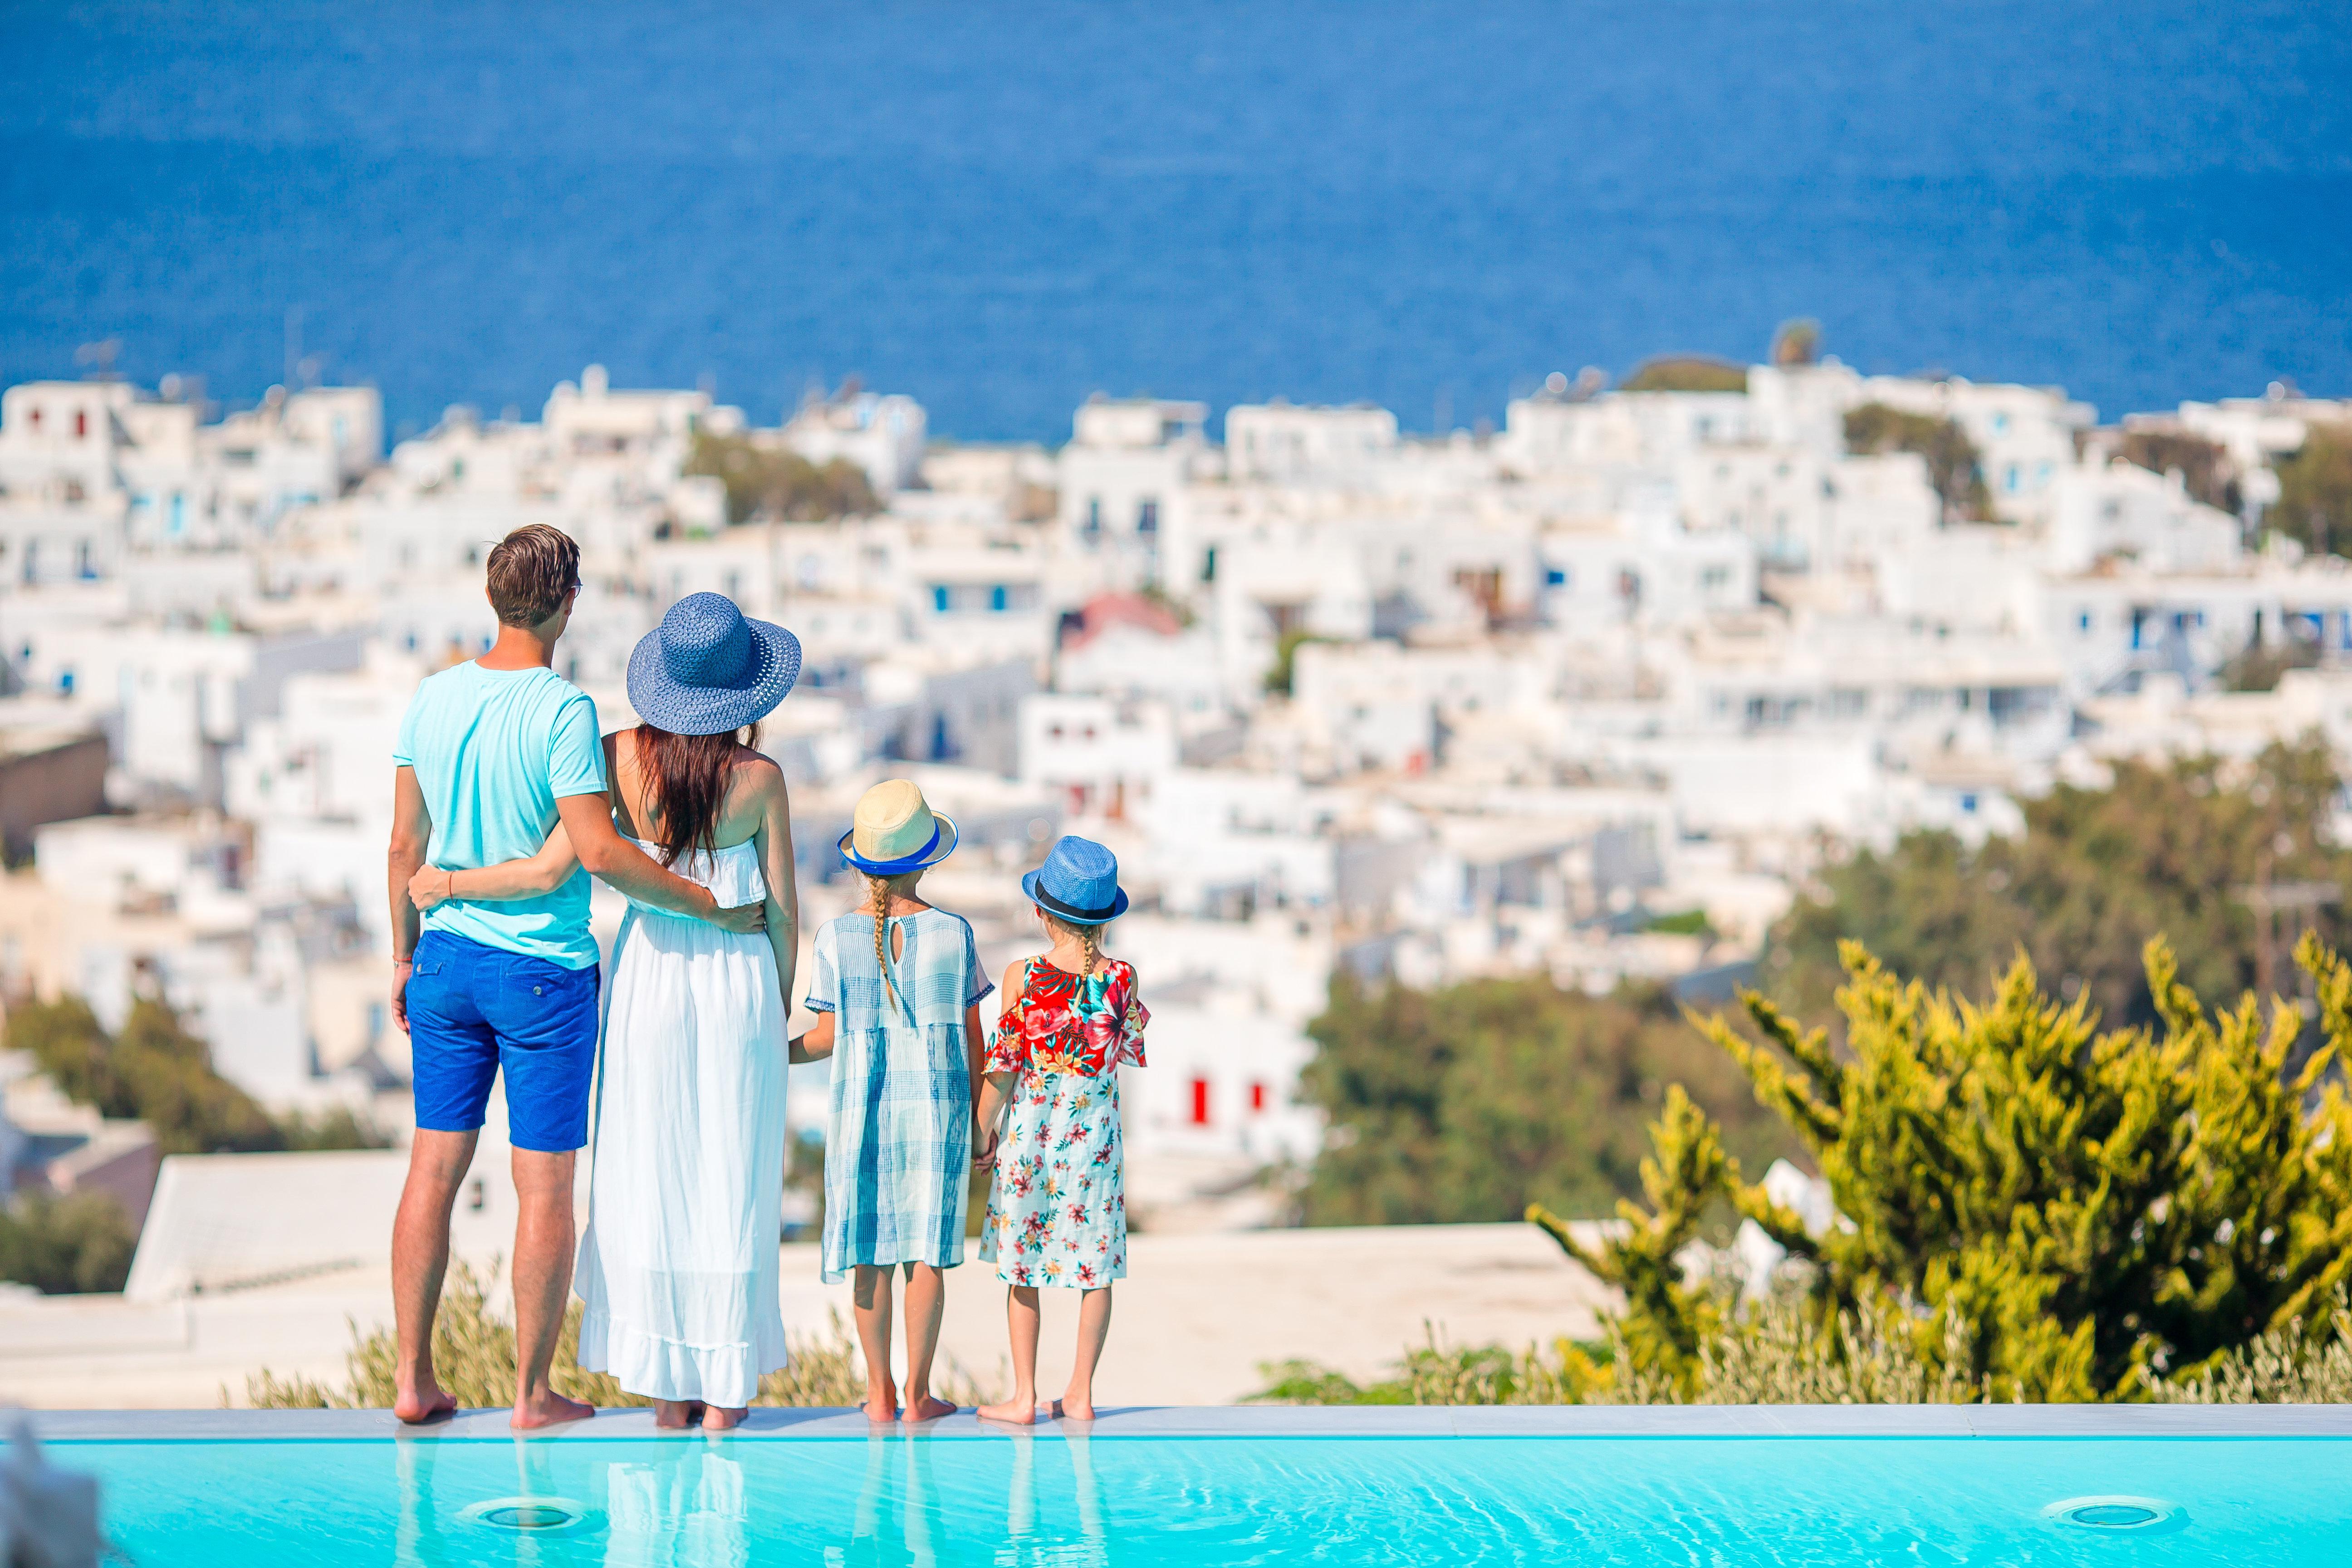 Traveler Awards: Κορυφαίος τουριστικός προορισμός για οικογενειακές διακοπές η